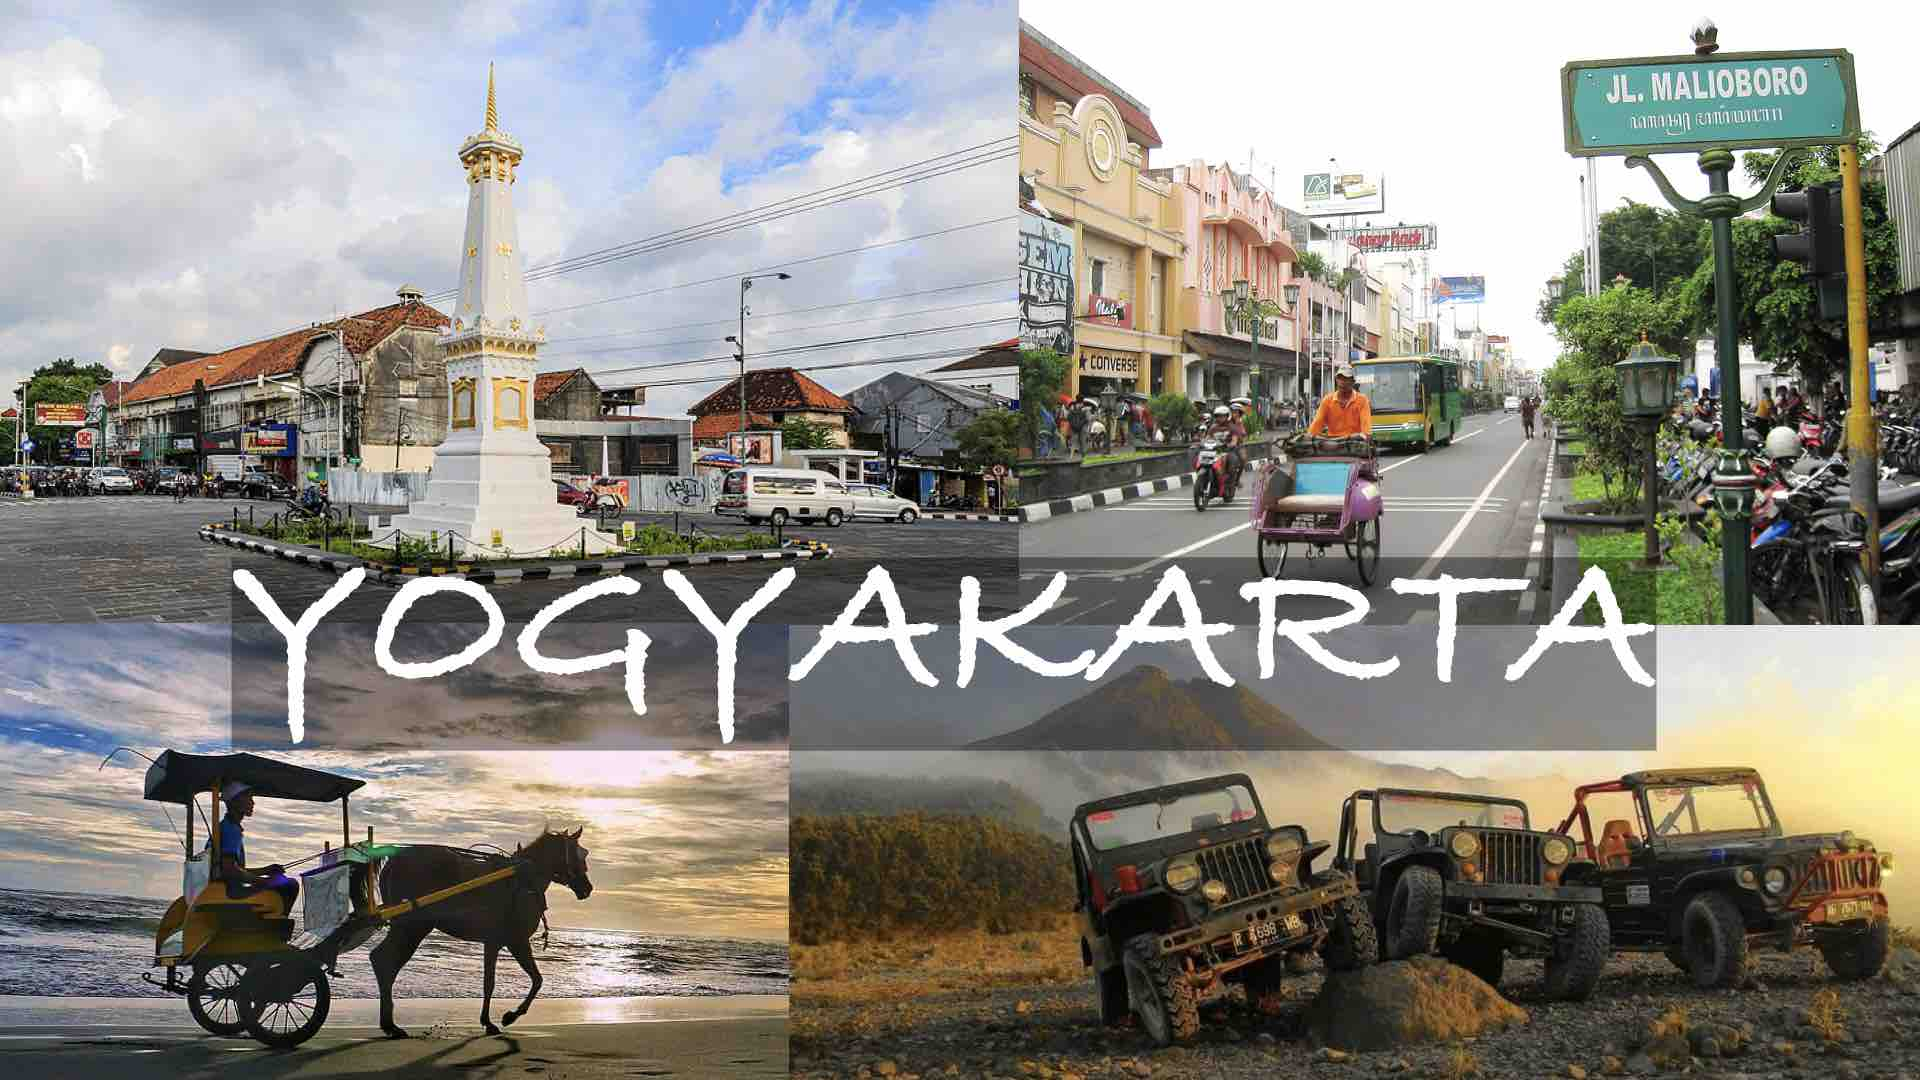 10 Tempat Wisata Terbaik Yogyakarta Yang Wajib Kamu Kunjungi